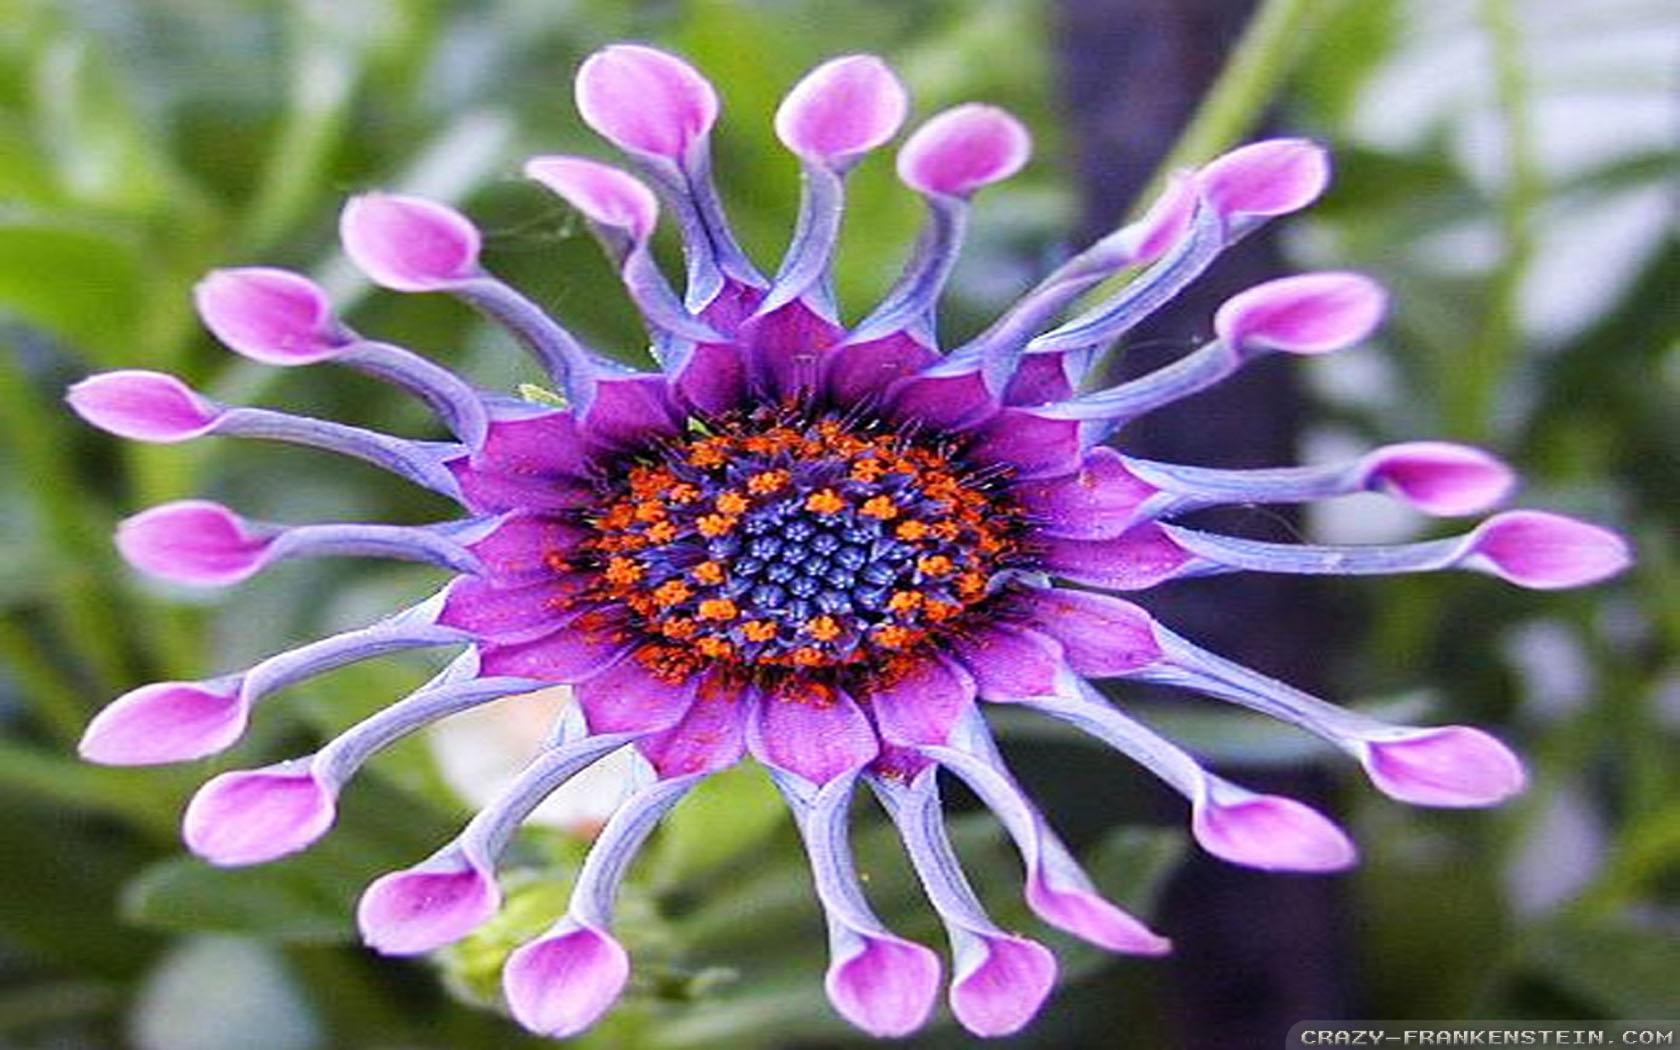 exotic-flowers-wallpapers-6.jpg 1,680×1,050 pixels | Gorgeous Flowers & Arrangements | Pinterest